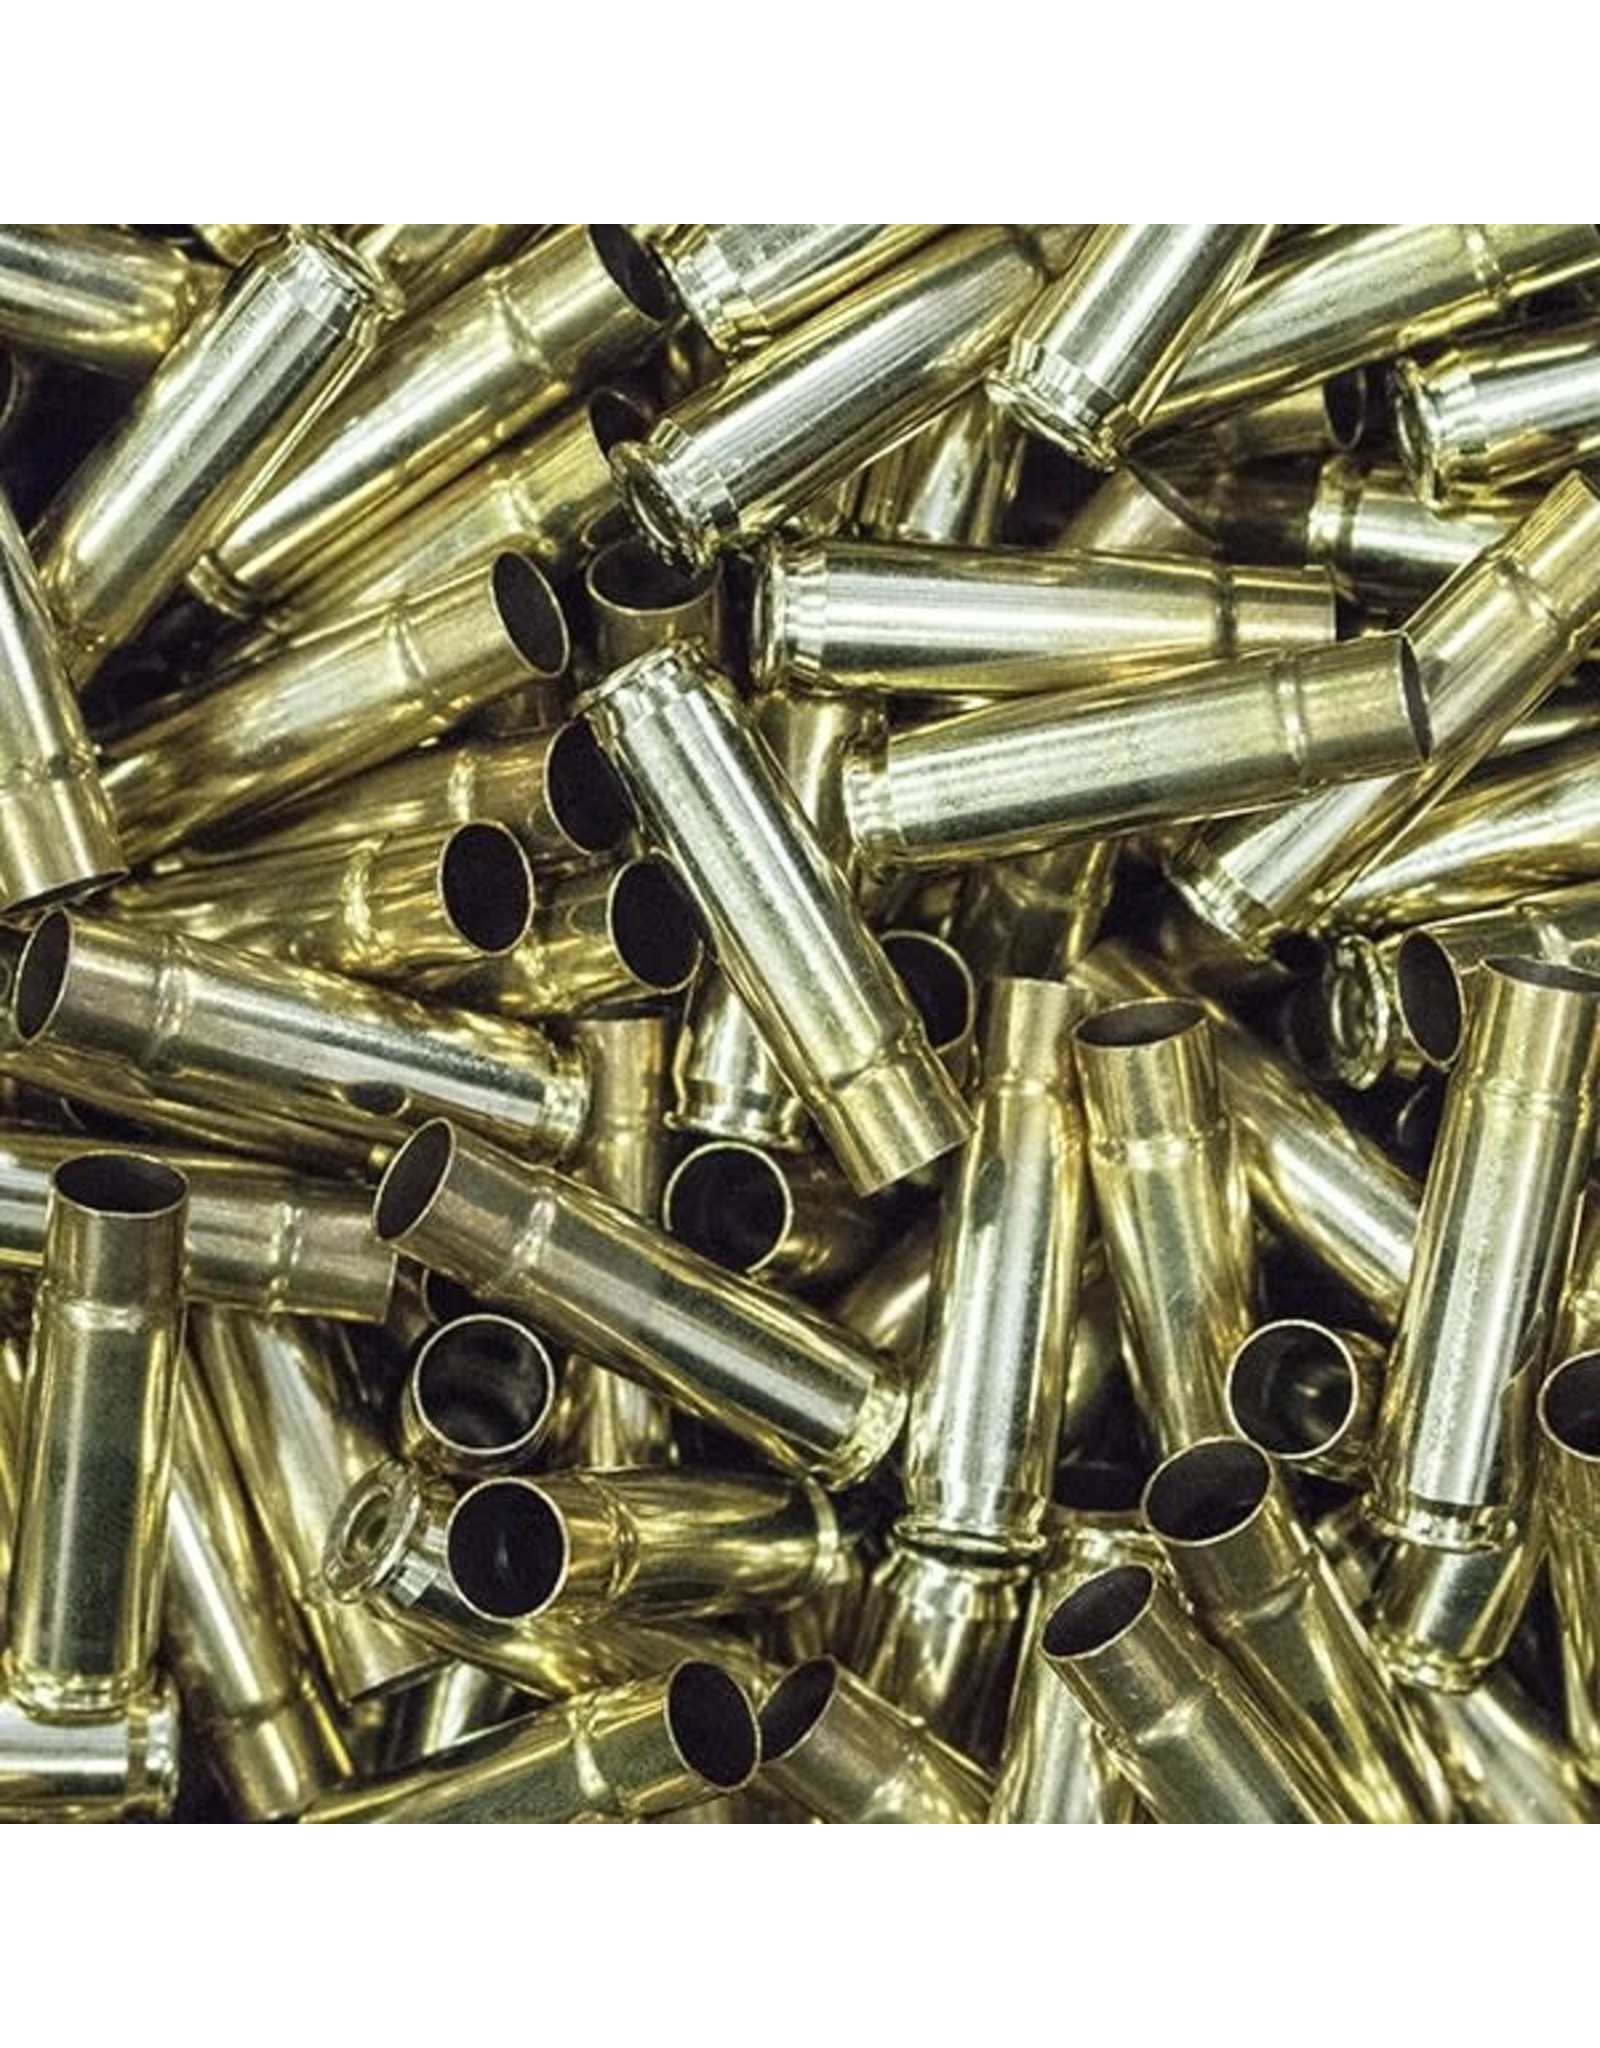 .30 Carbine Brass - 50 Count